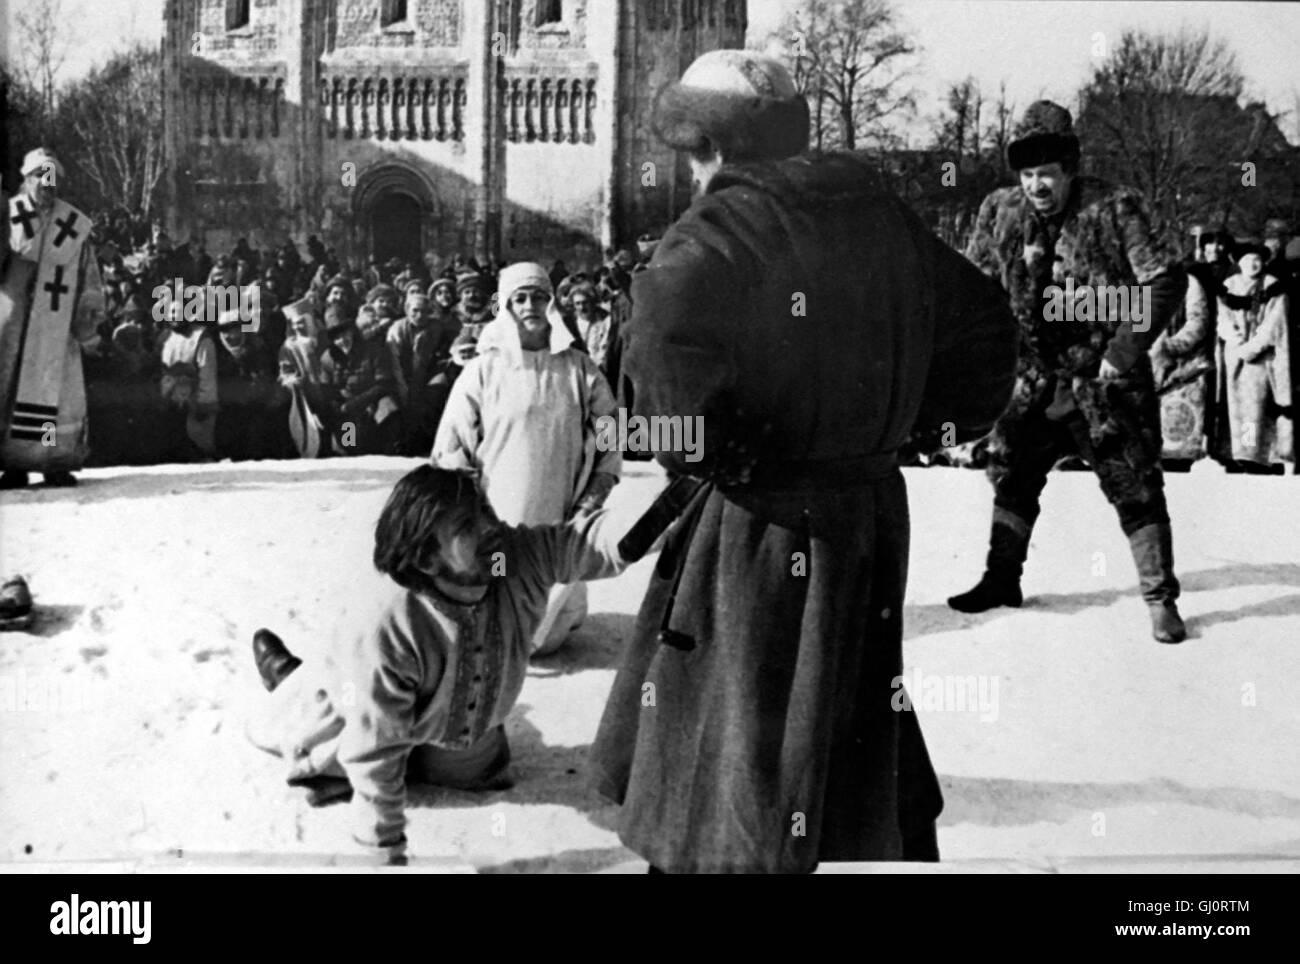 ANDREJ RUBLJOW- Rußland, im Jahre 1400. Als der Mönch und Maler Andrej Rubljow (Anatolij Solonizyn,liegend) mit Stock Photo